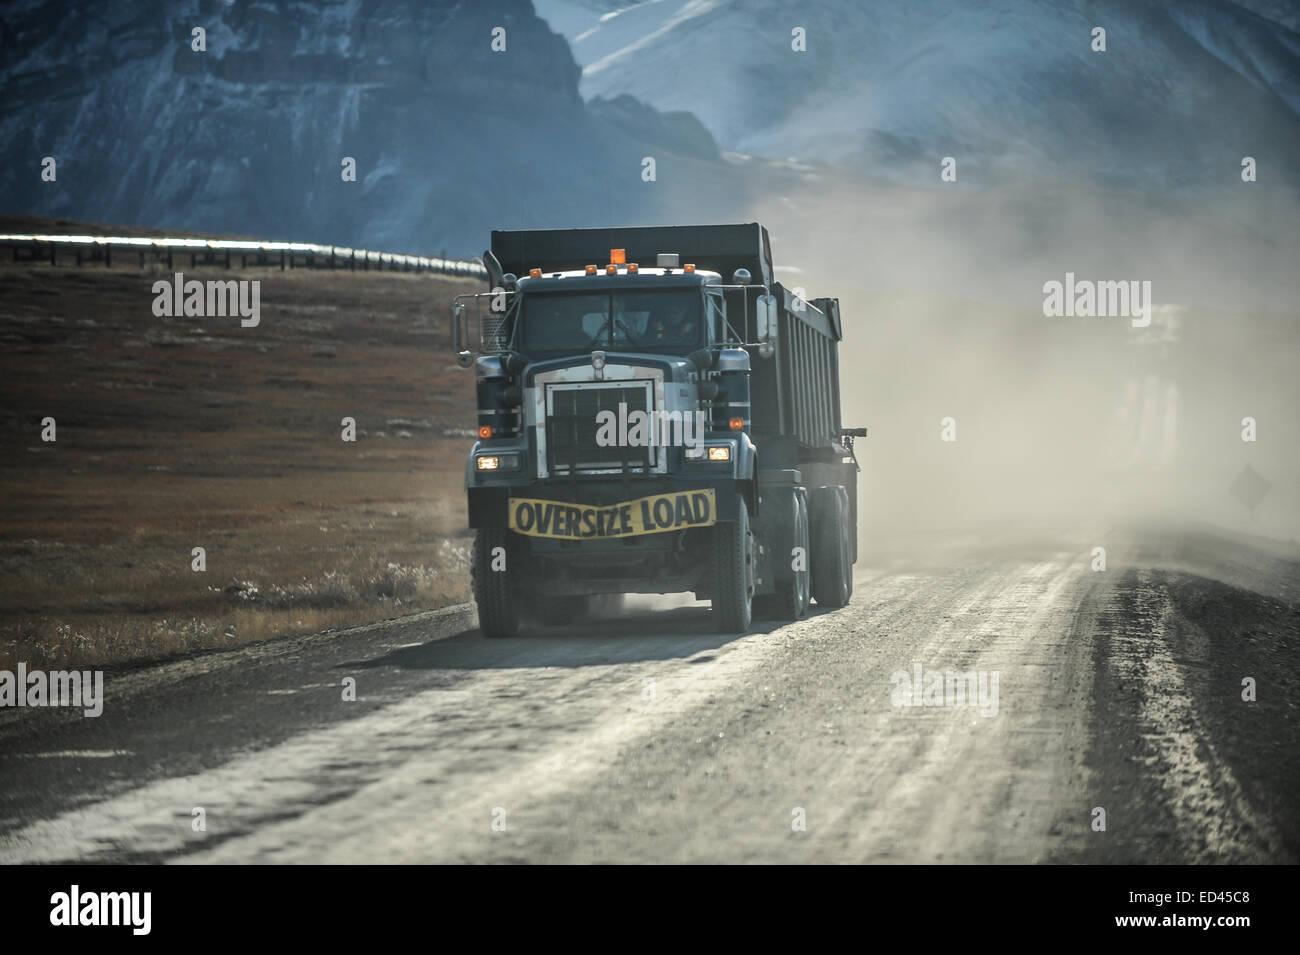 Eighteen wheeler truck with an oversize load sign, Alaska, US - Stock Image